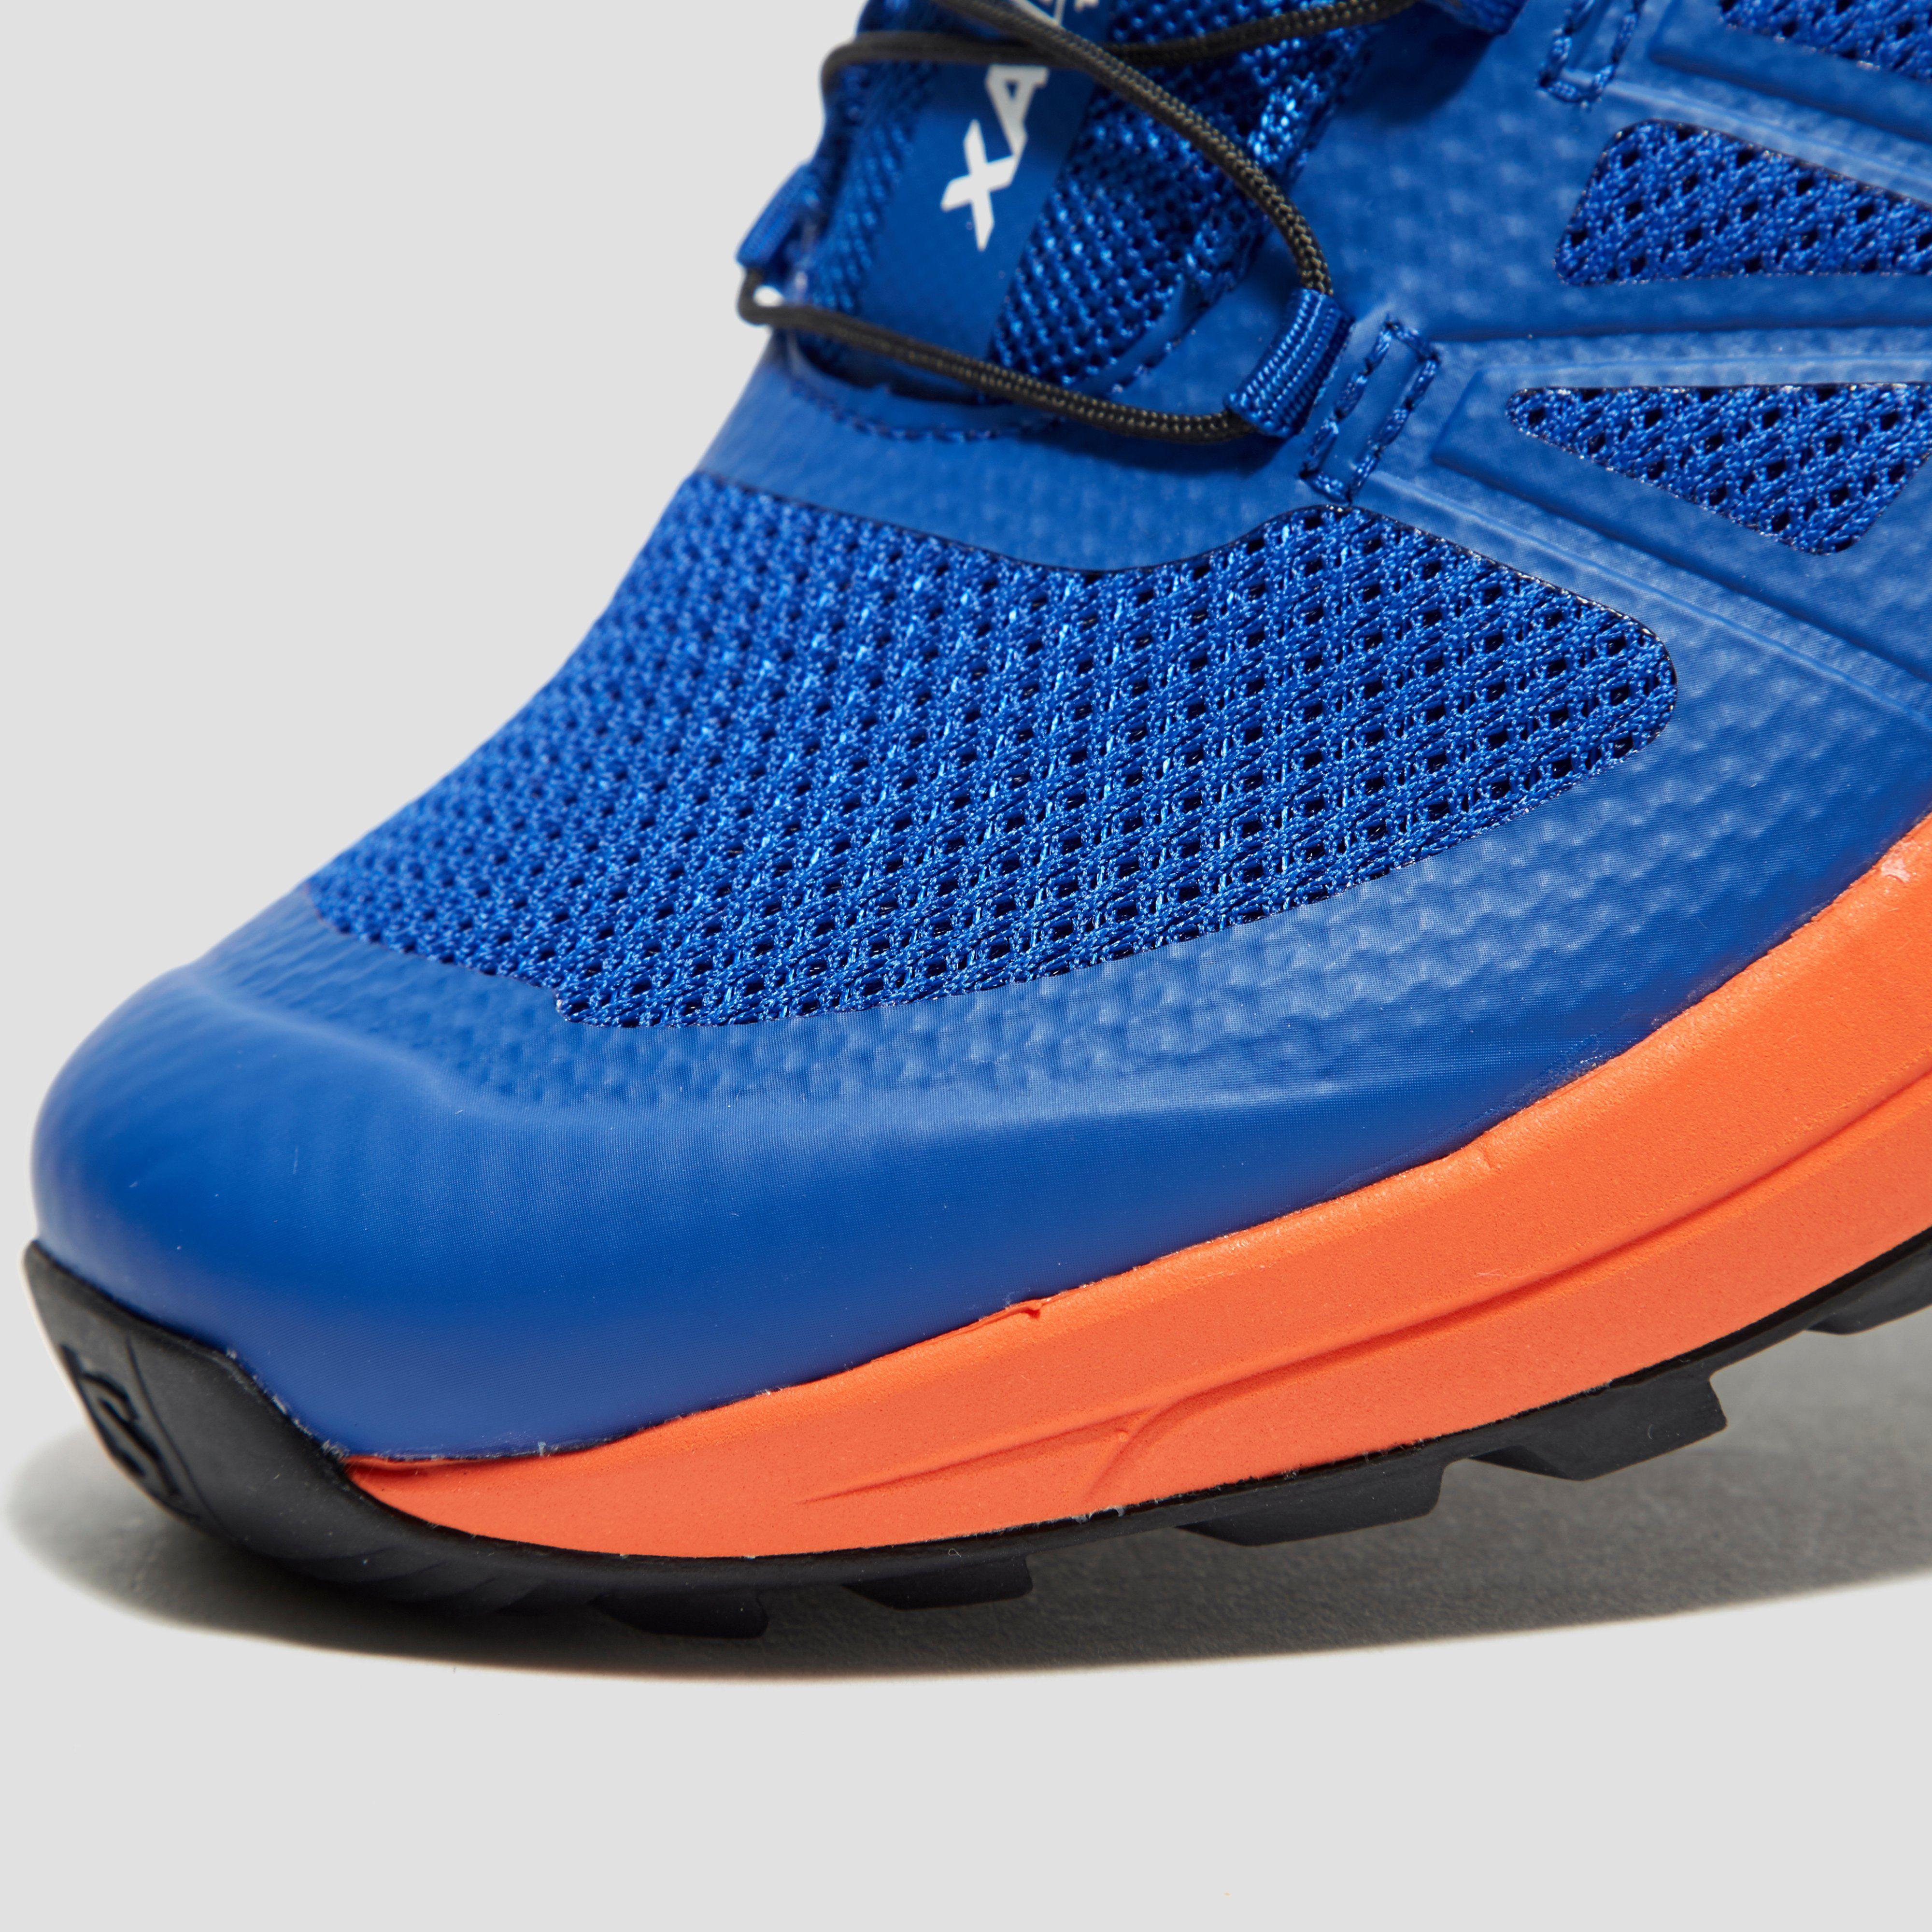 Salomon XA Enduro Men's Trail Running Shoes